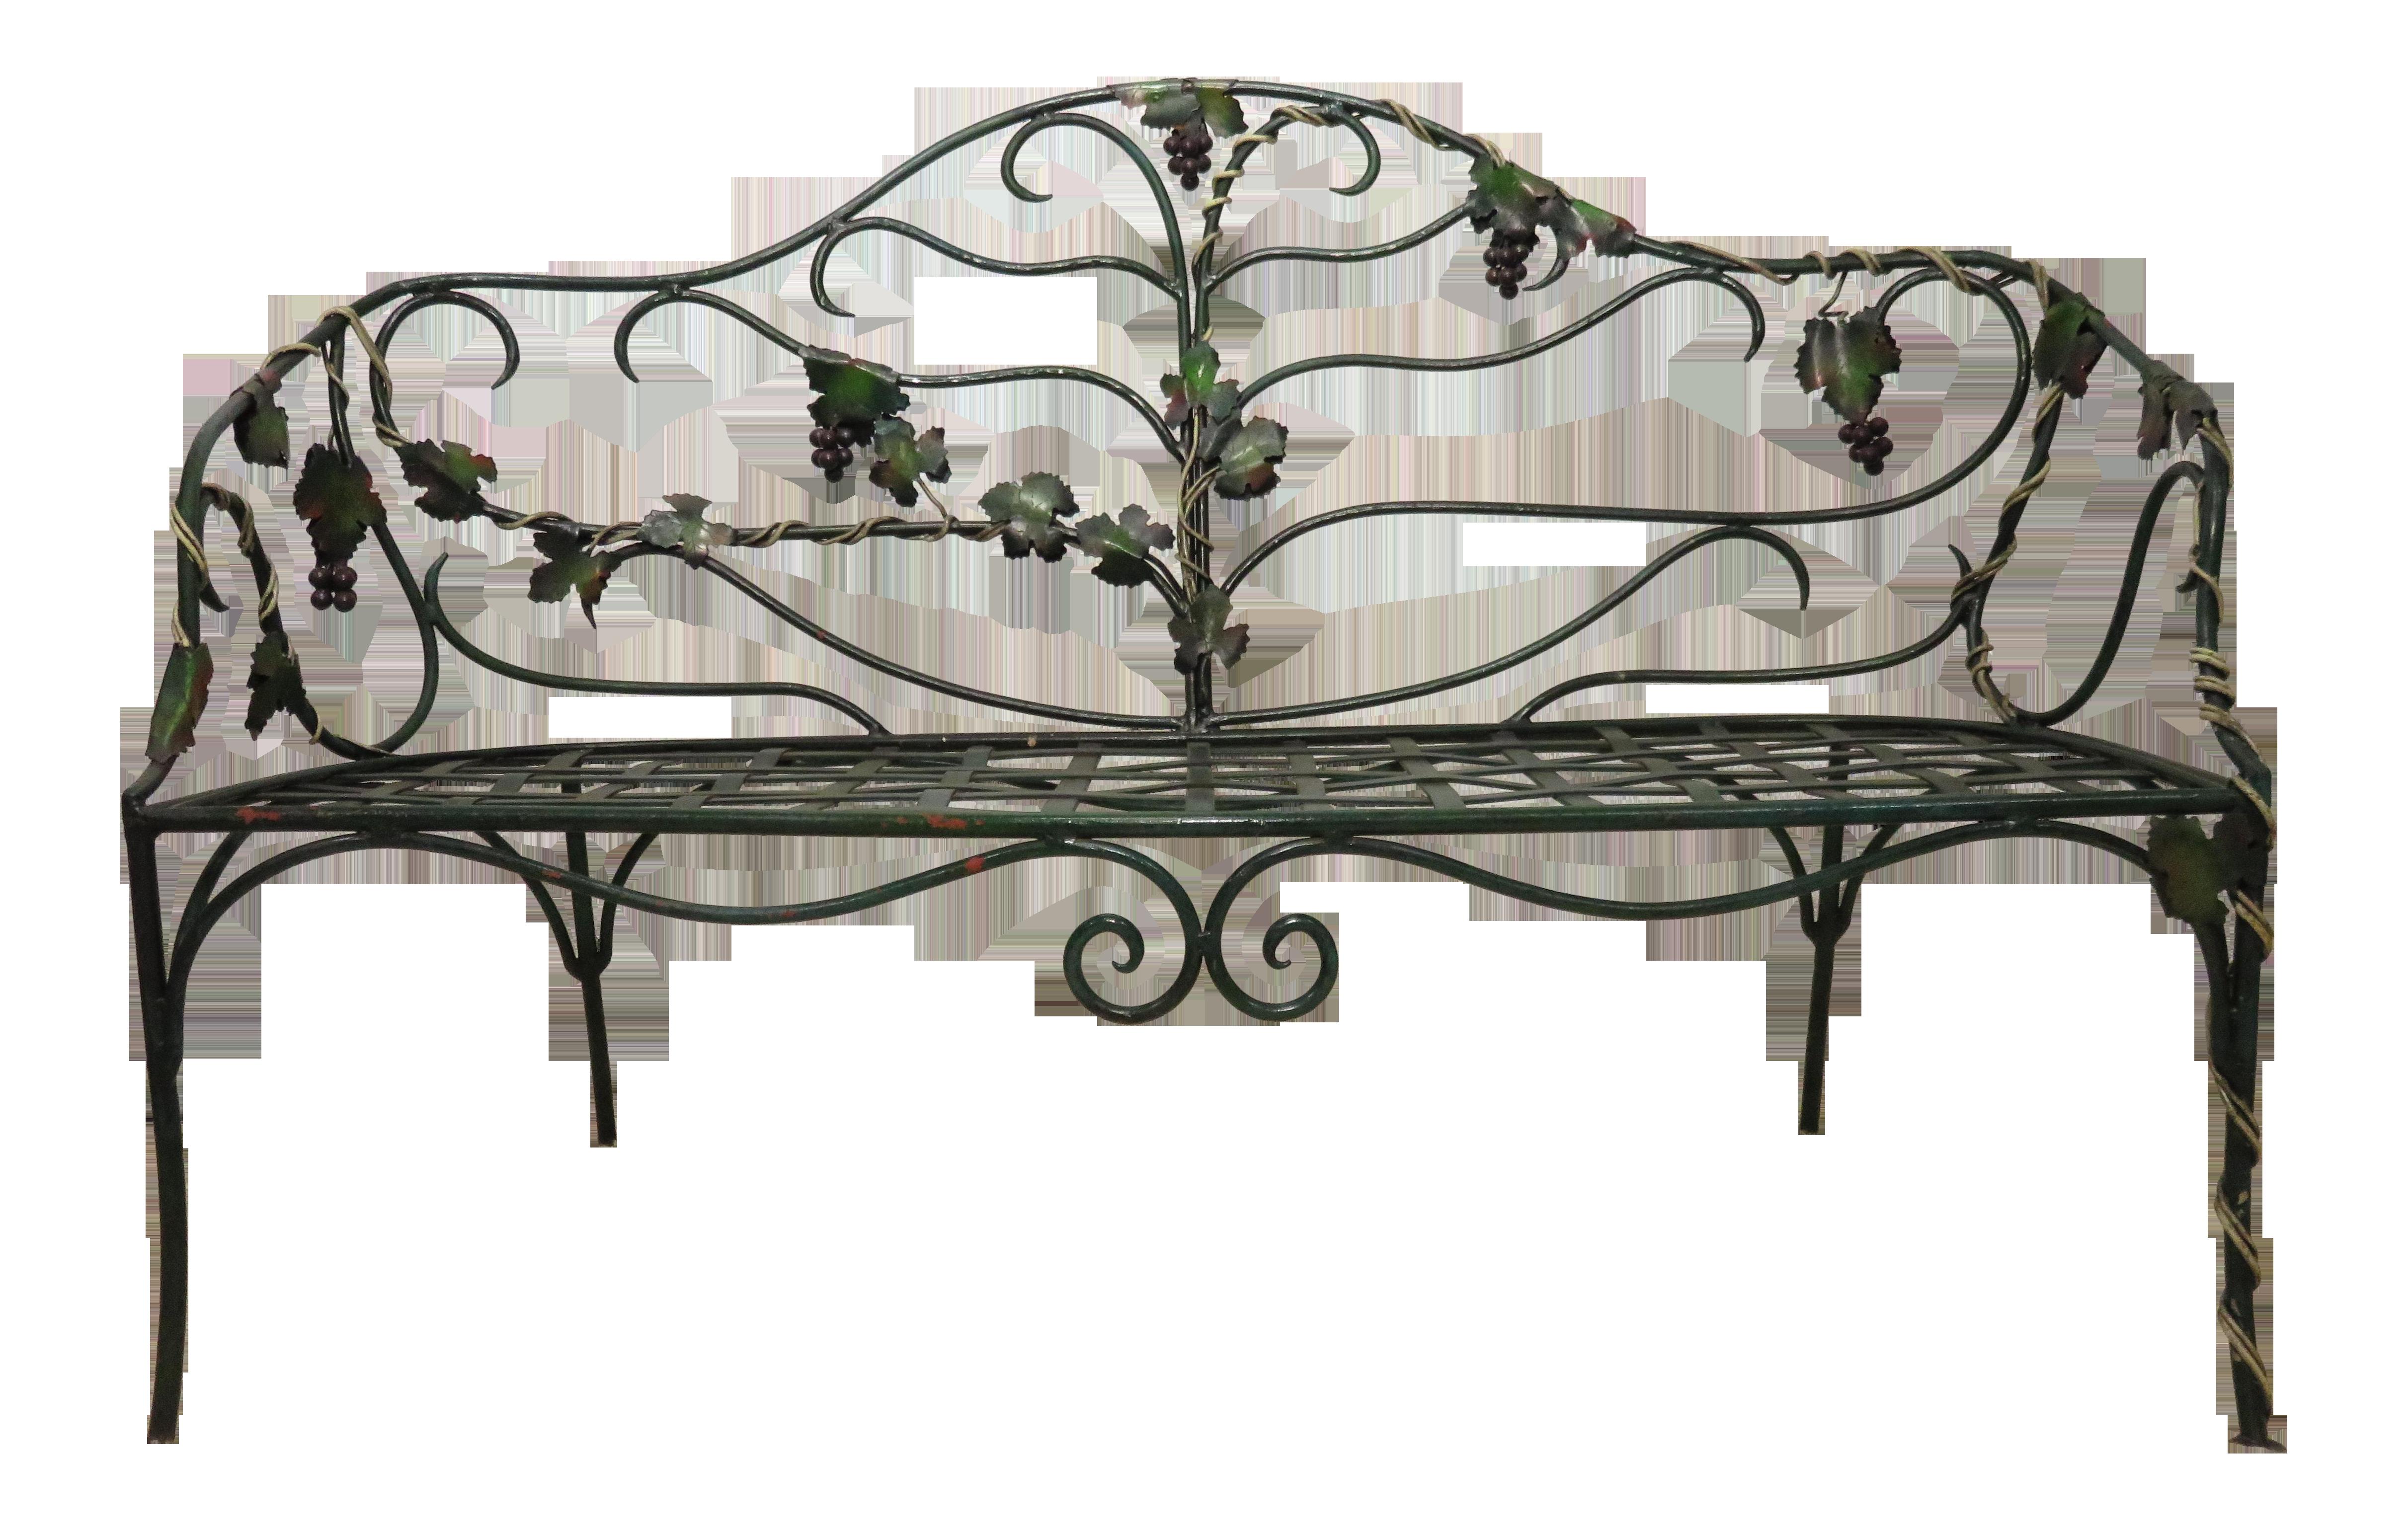 wrought youtube broken how cast repar watch garden rebuild i wood bench iron a